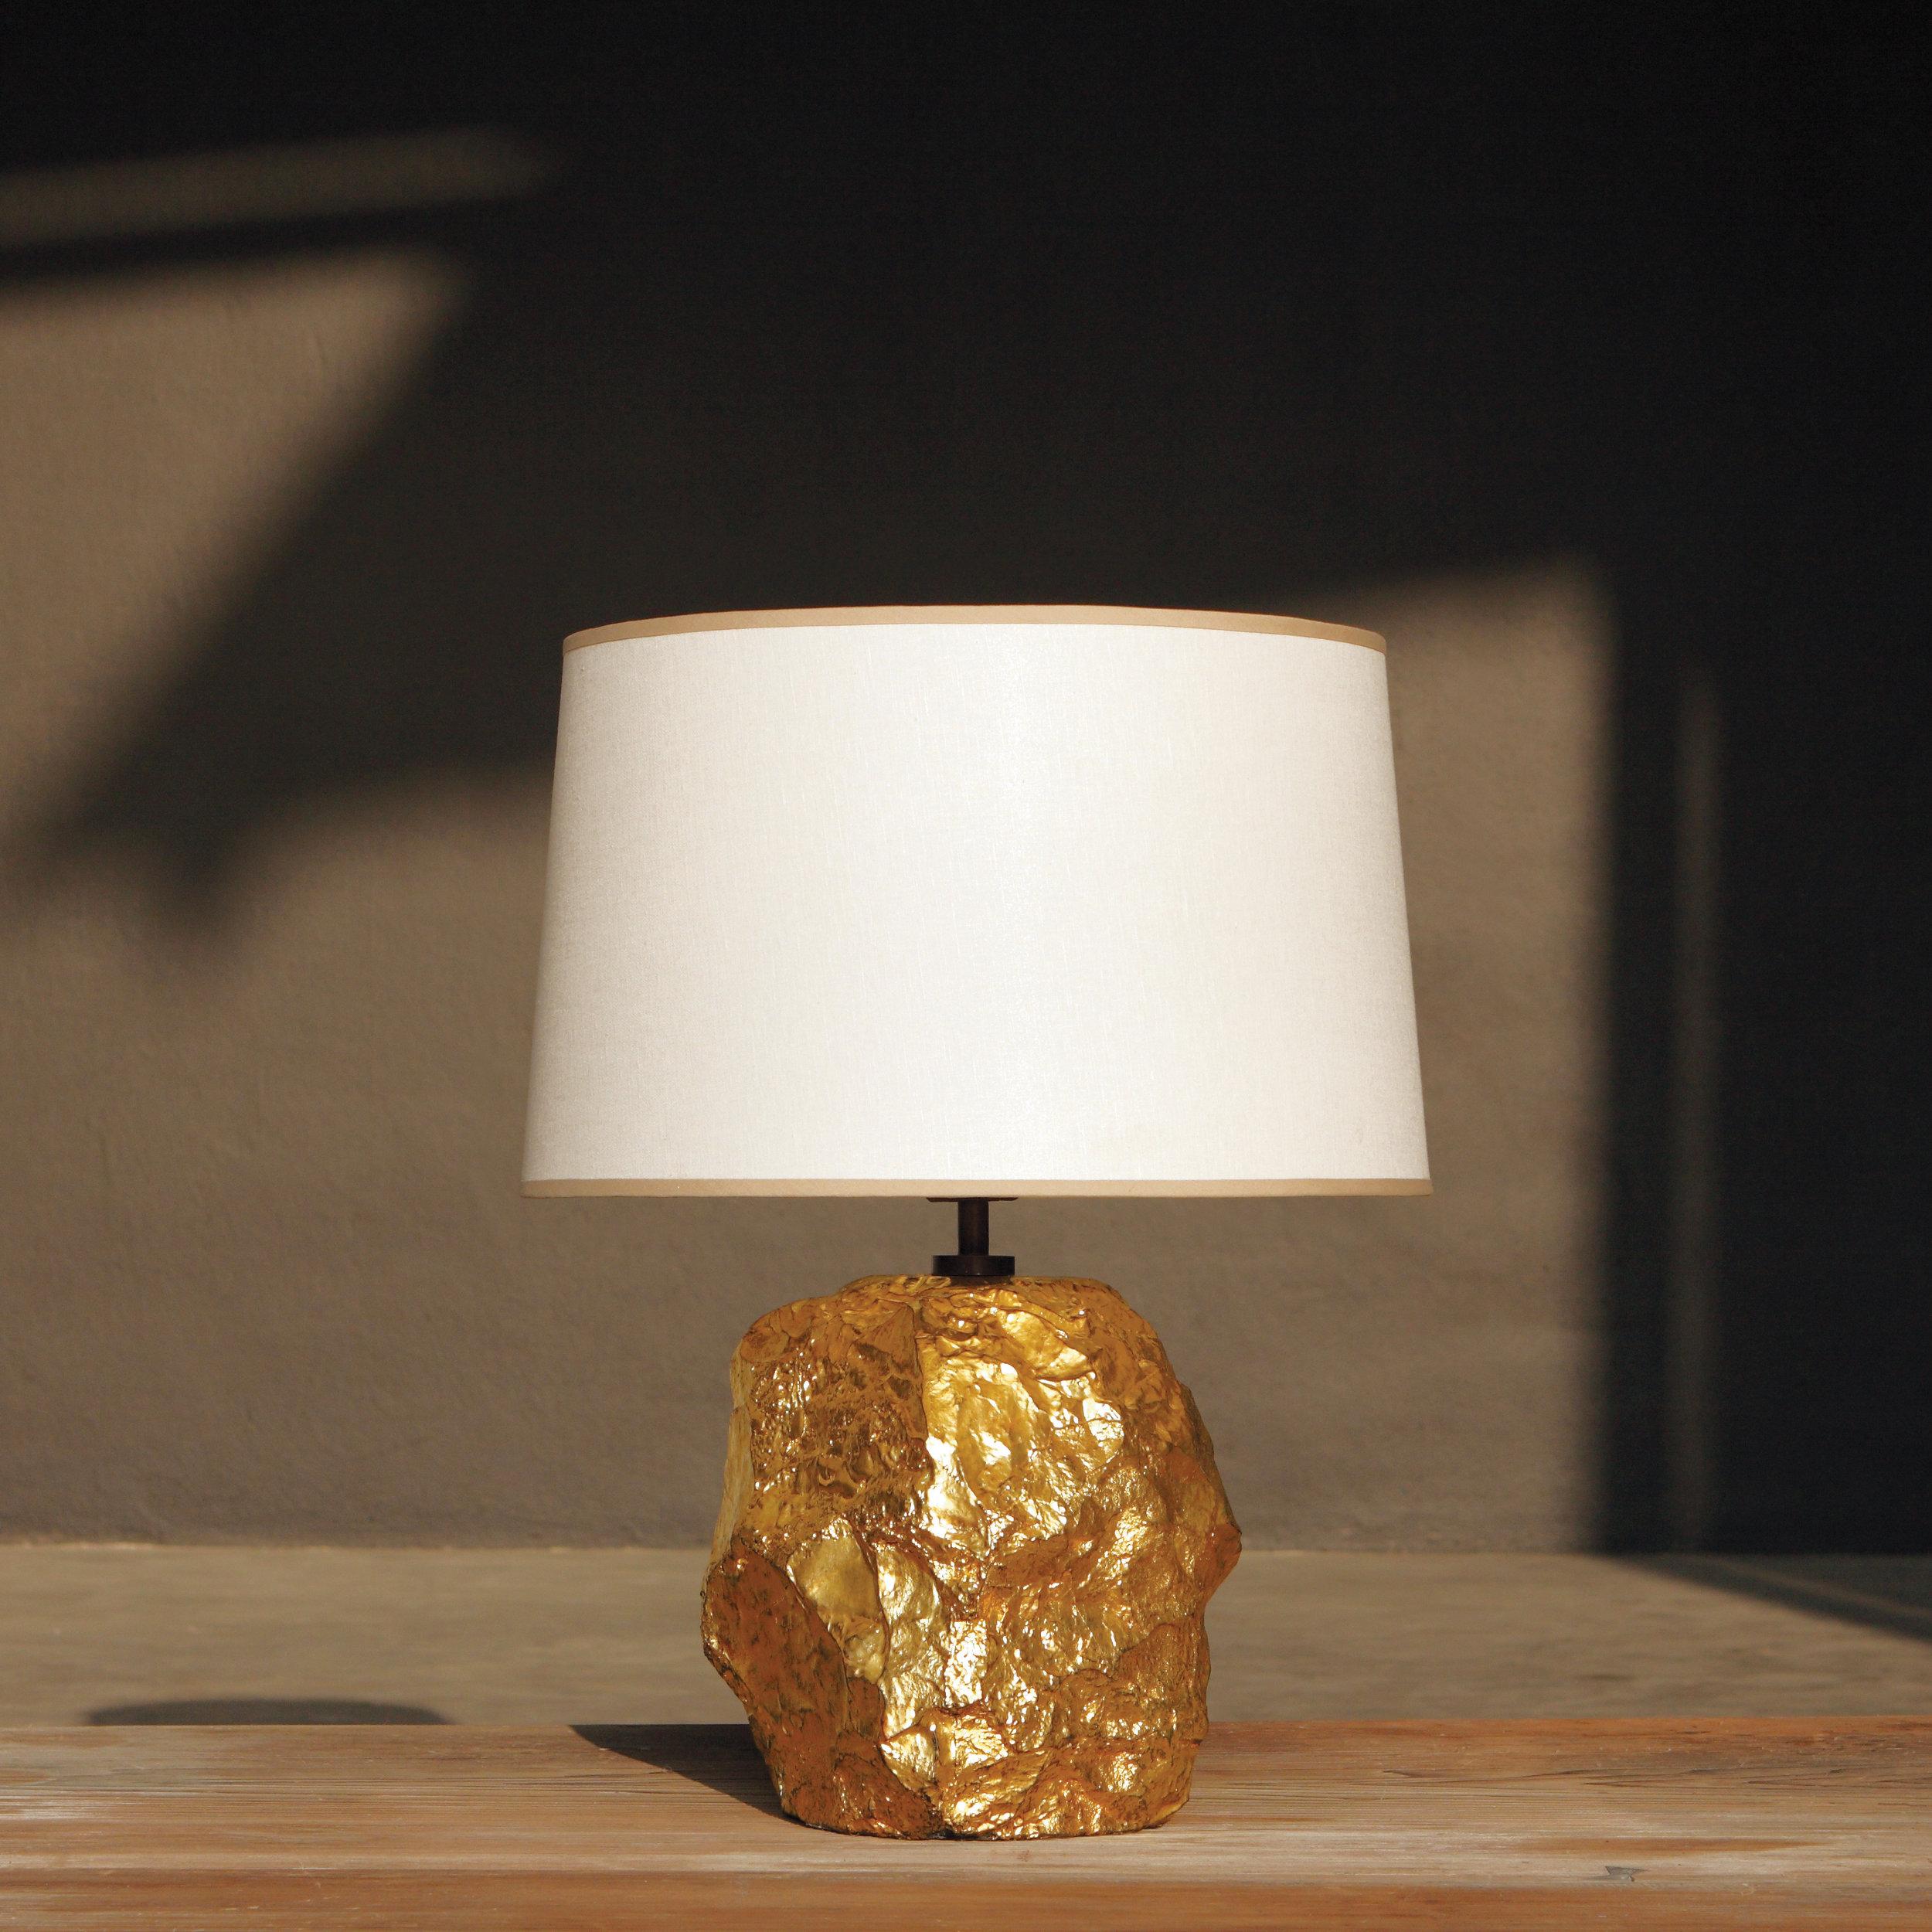 alexander_lamont_cornice_table_lamp_MG_3641.JPG